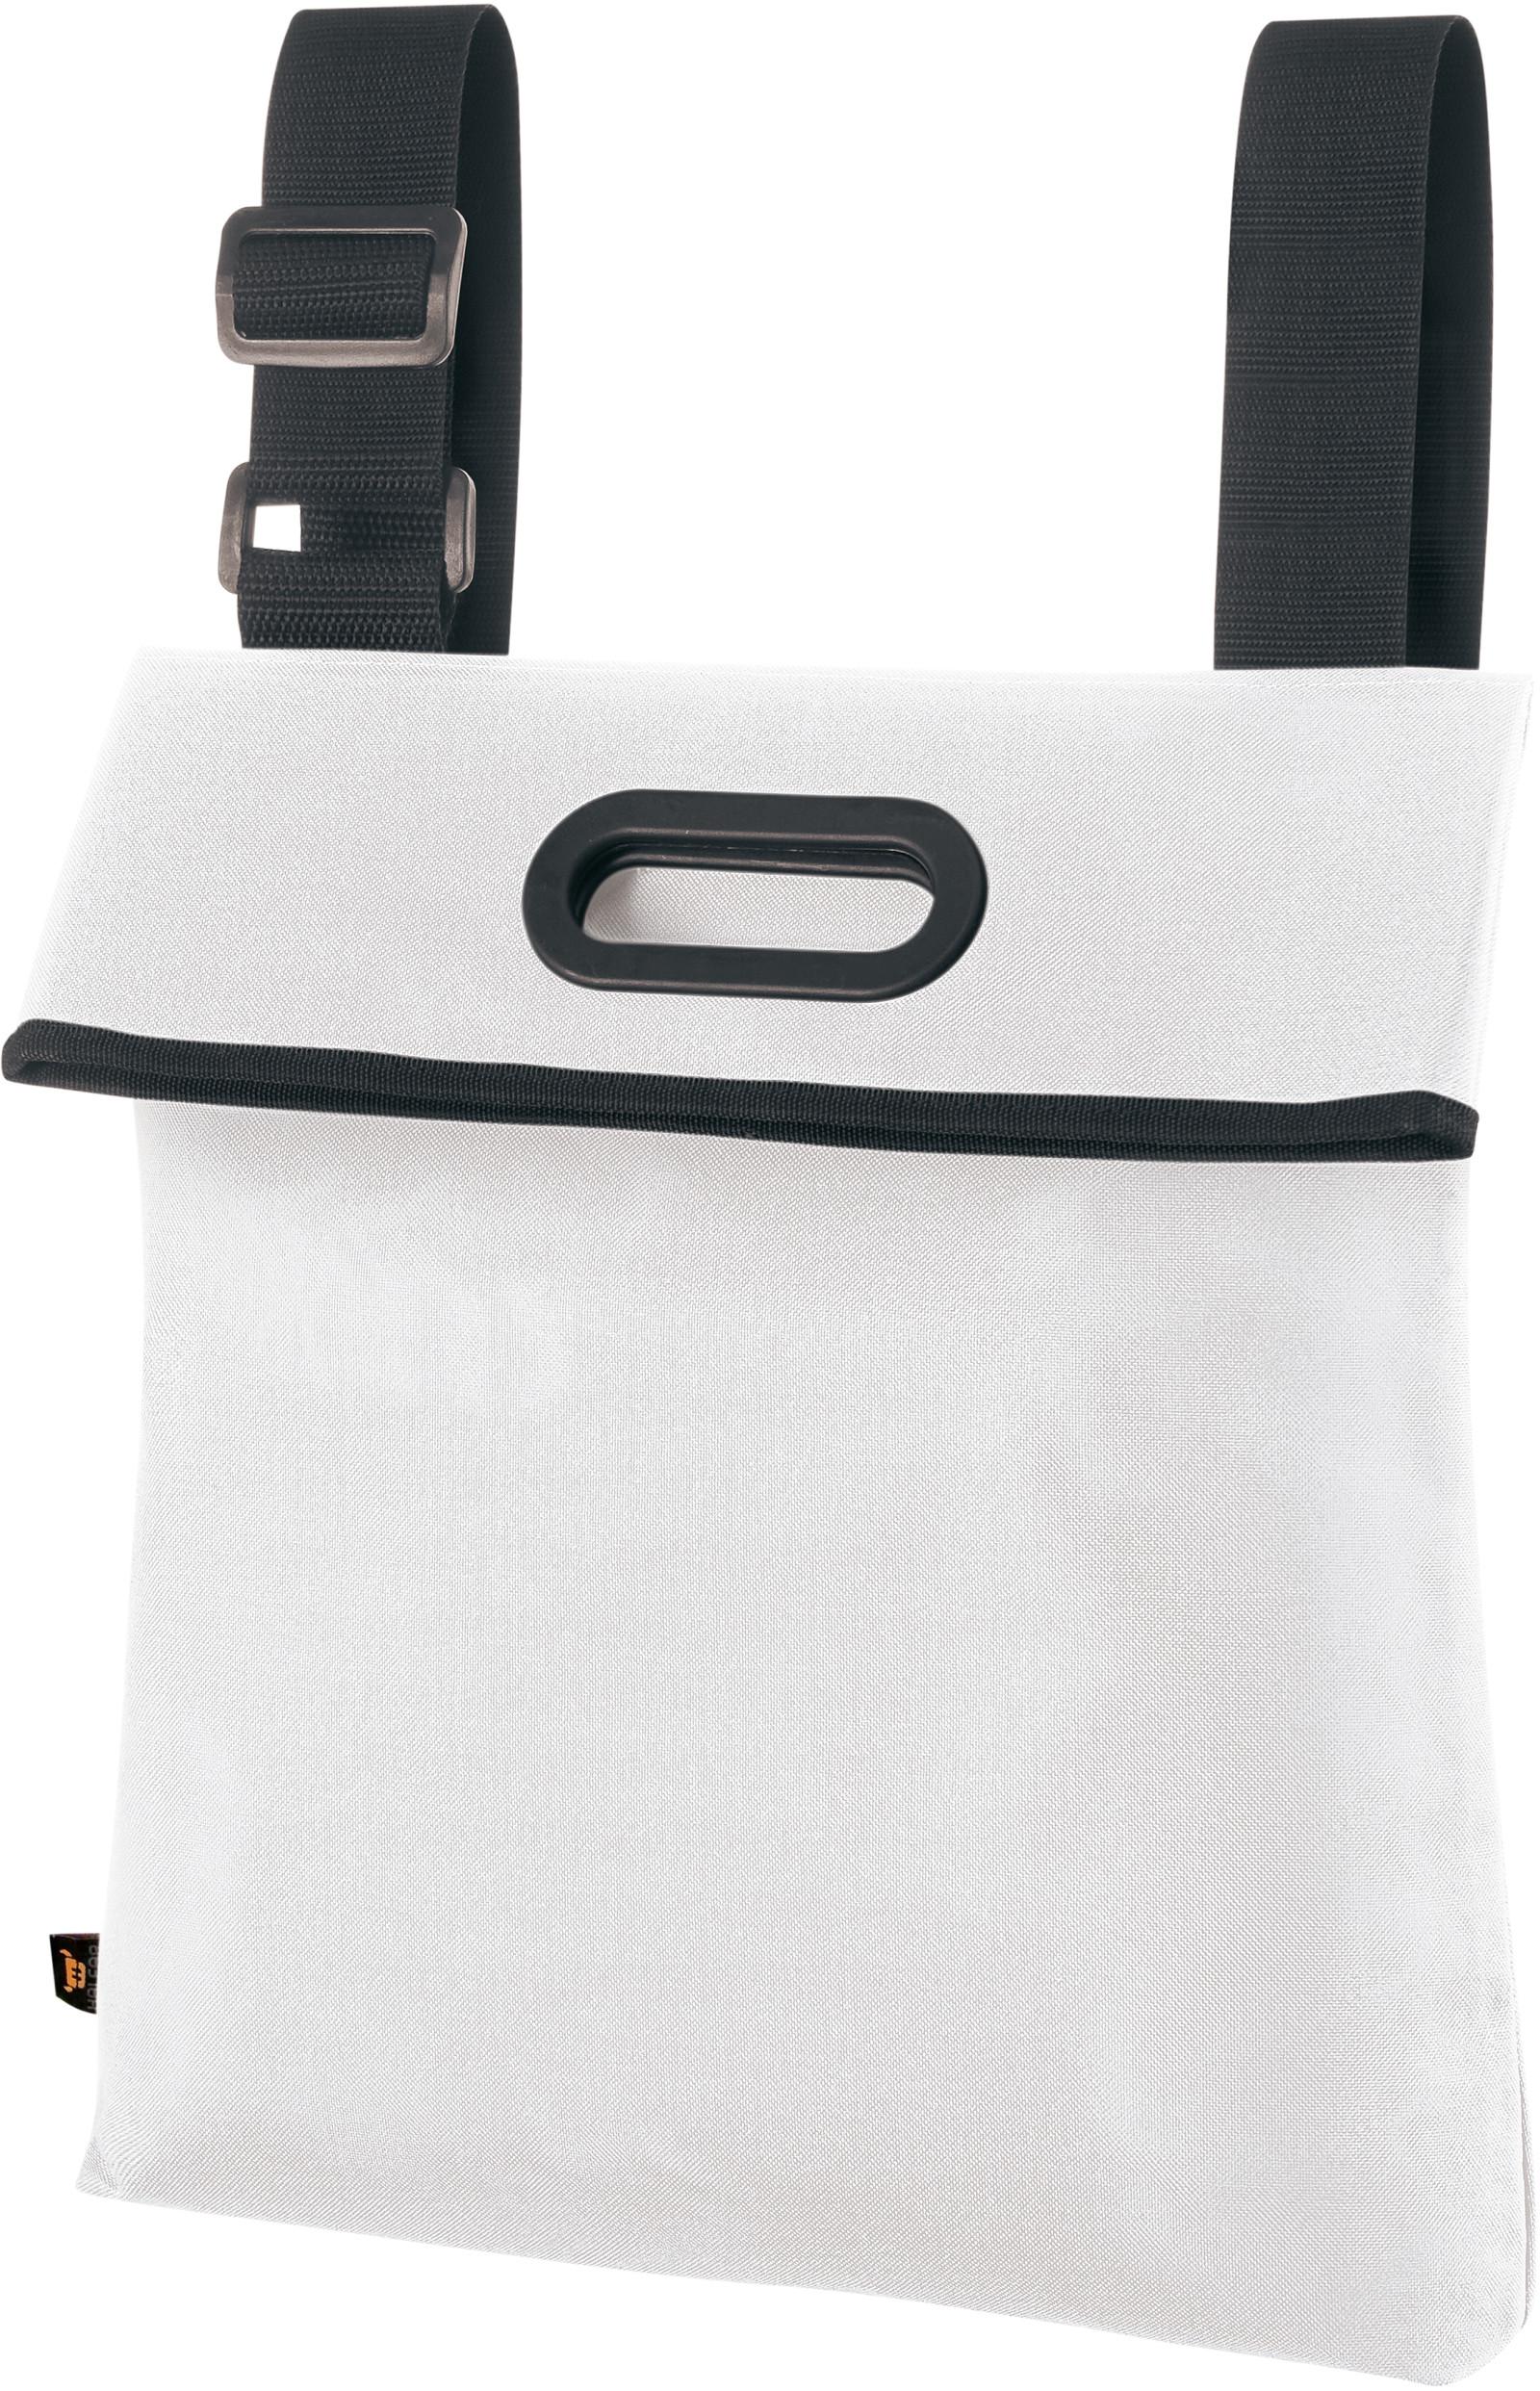 Taška přes rameno EASY XL